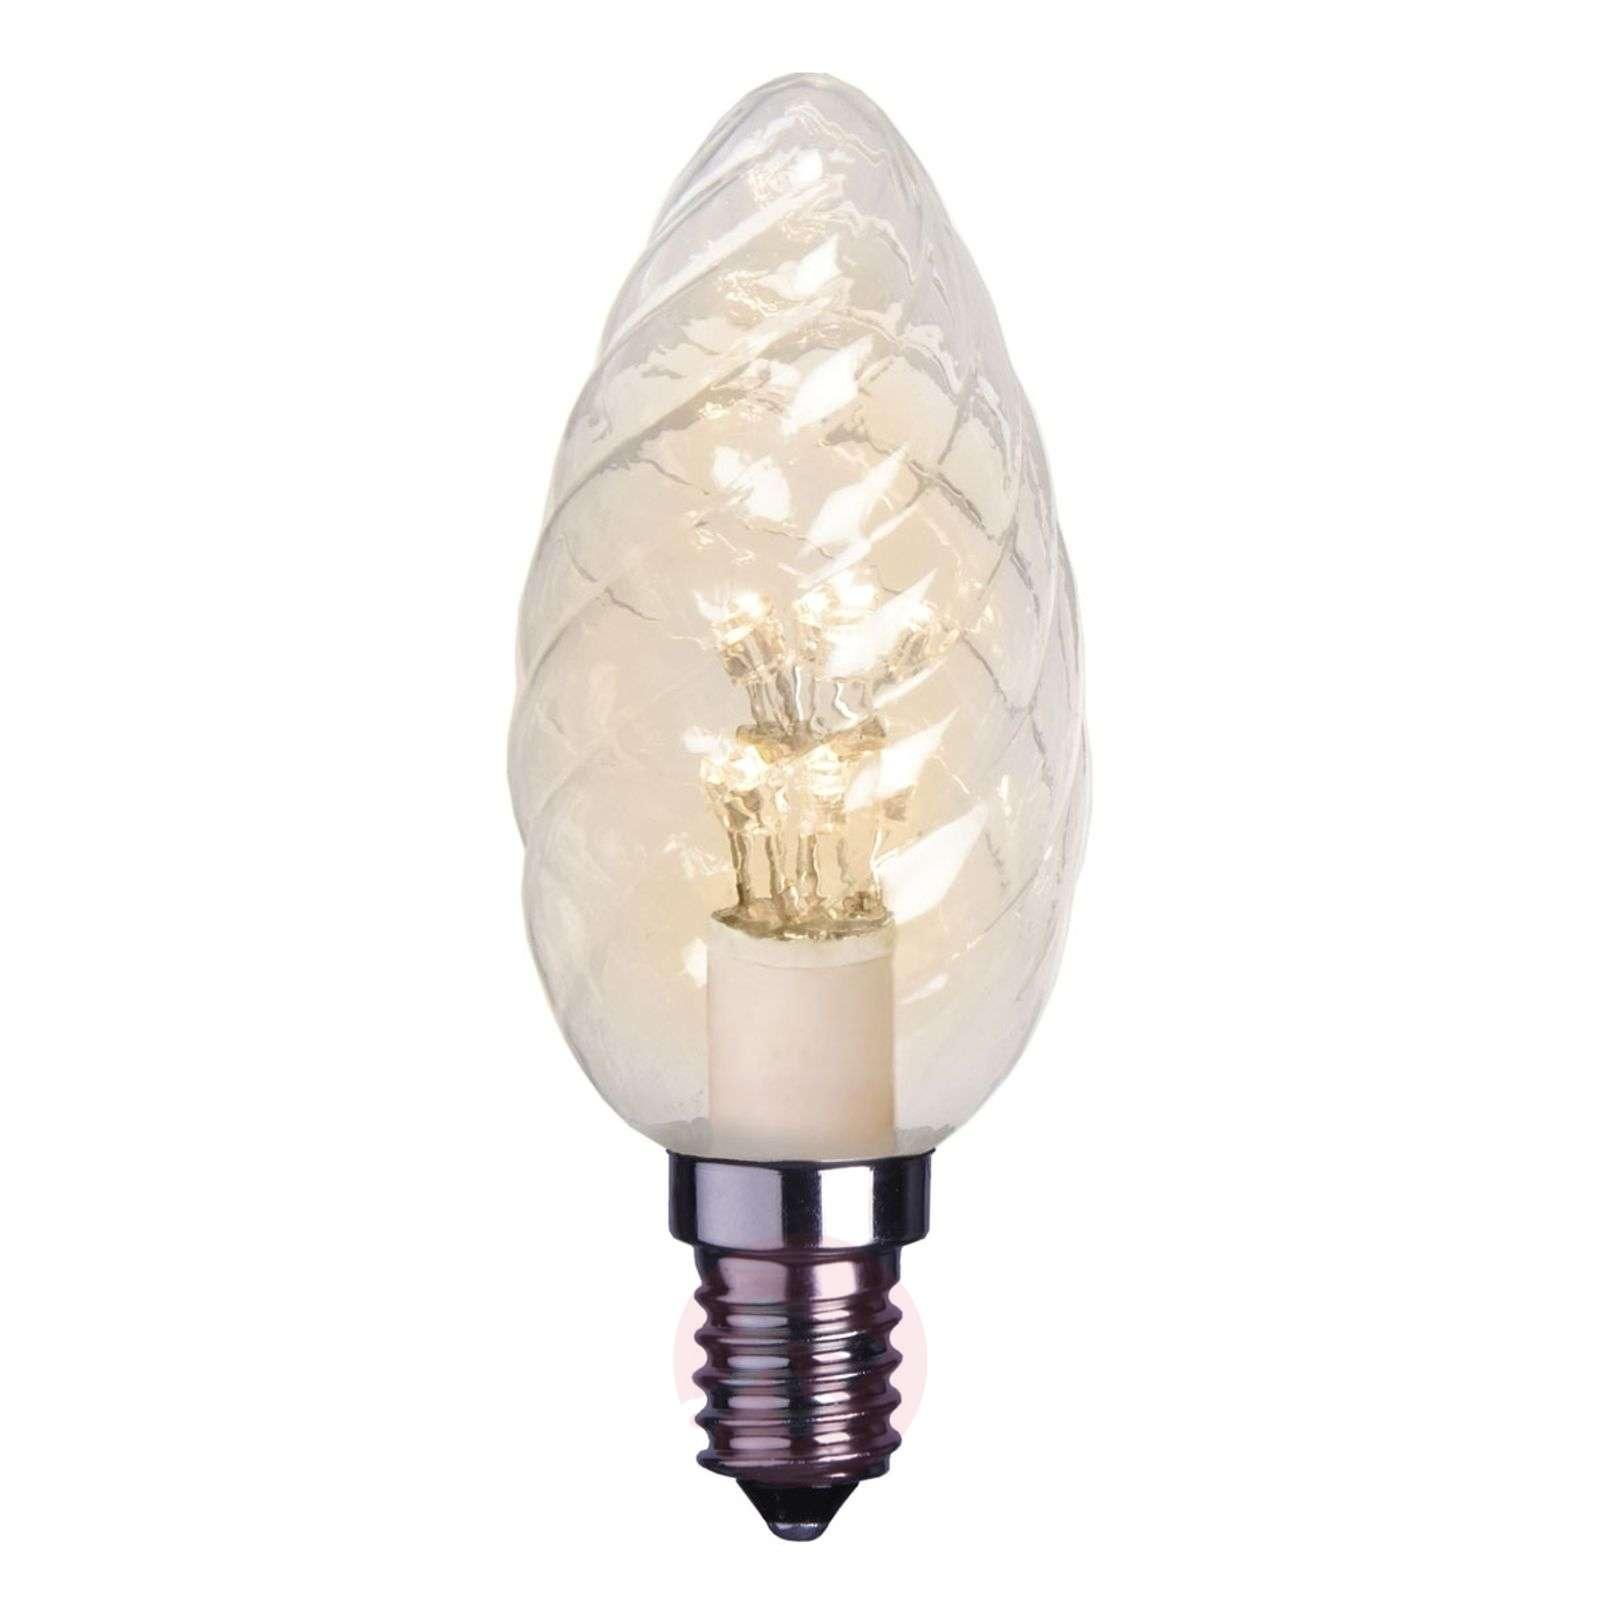 E14 0,9 W kirkas LED-kynttilälamppu, kierretty-1522106X-01